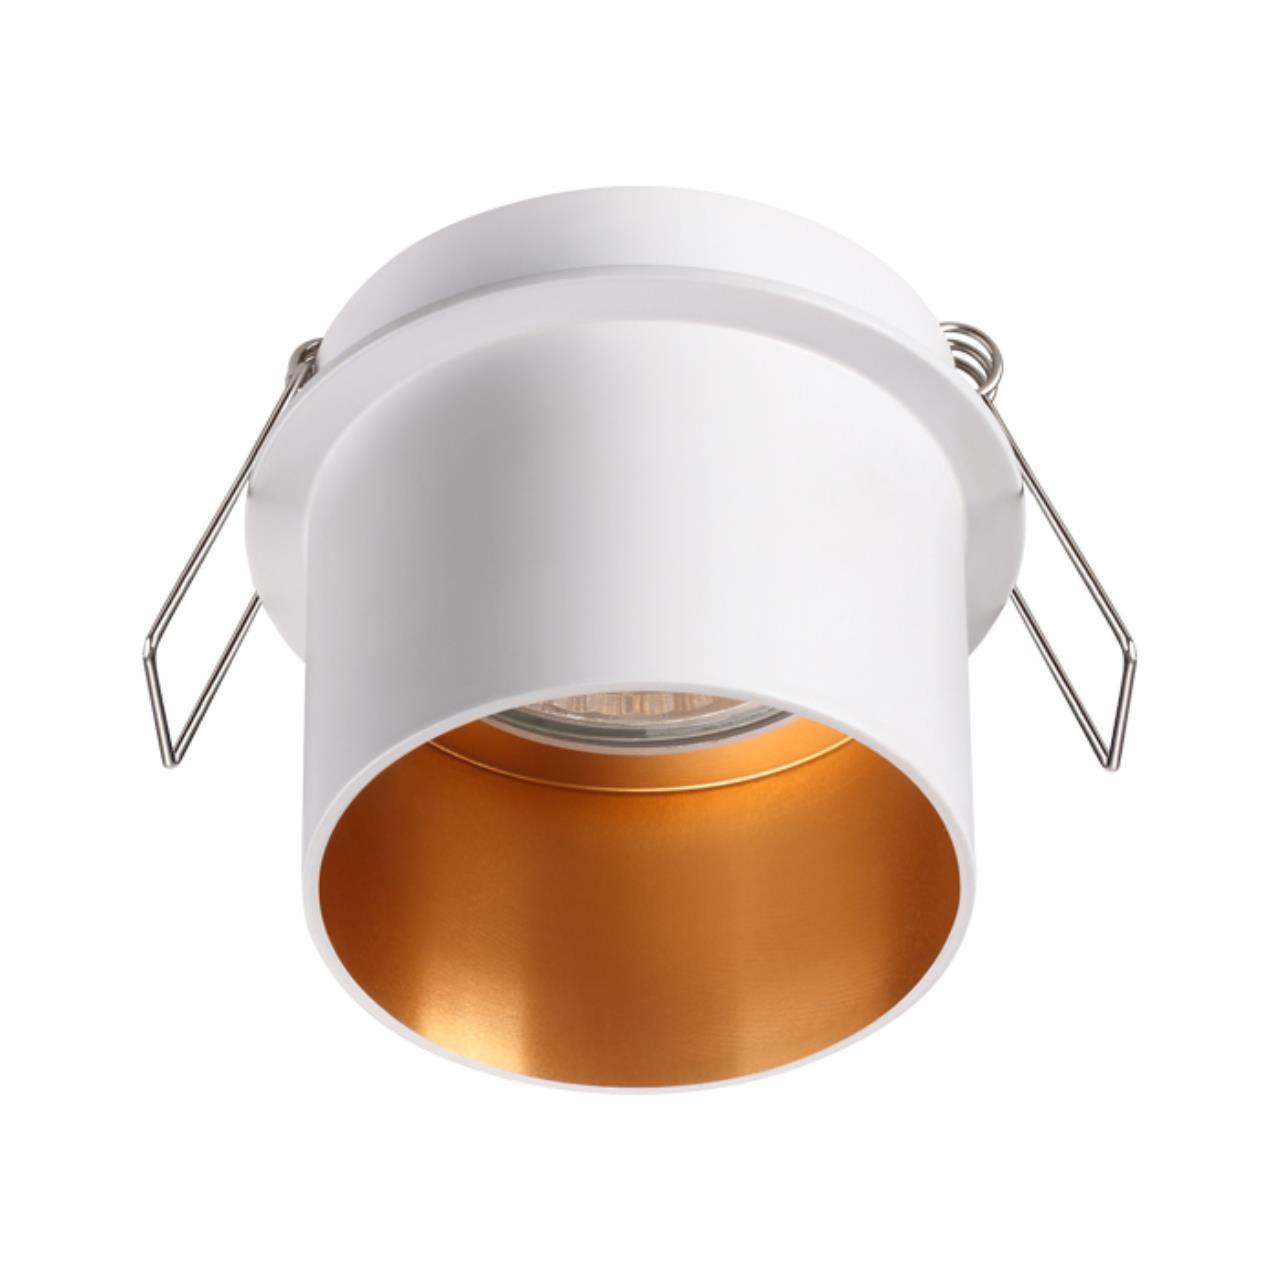 370432 SPOT NT19 130 белый Встраиваемый светильник IP20 GU10 50W 220V BUTT